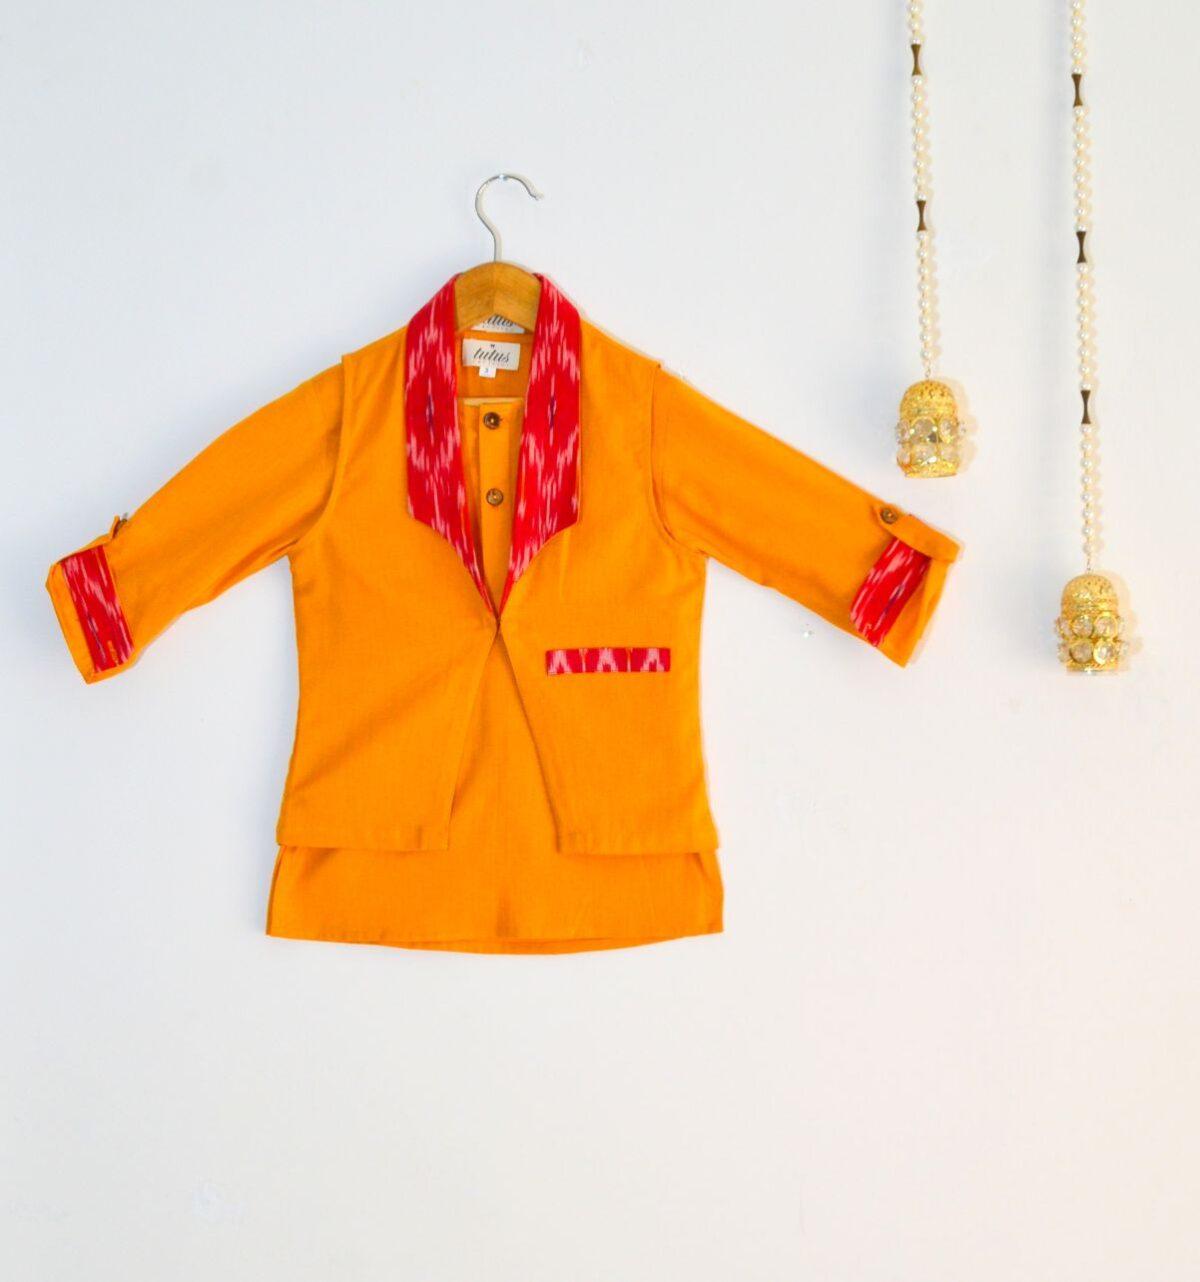 DSC 0054 Short Kurta with Ikat Jacket and Pant